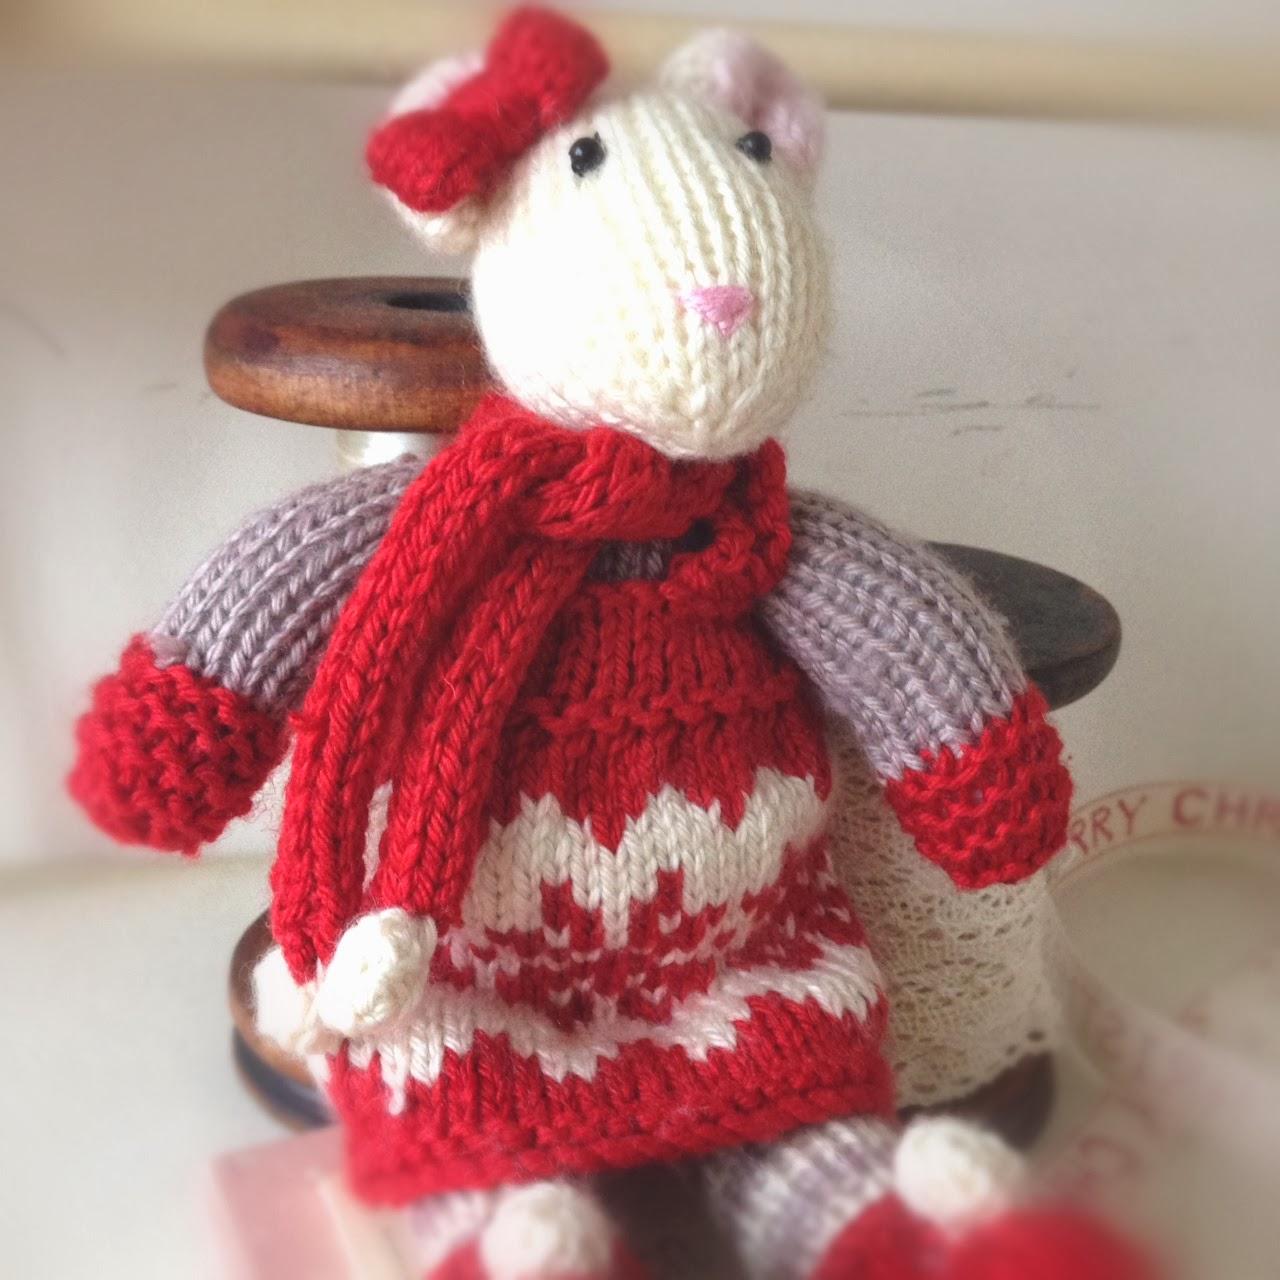 Knitting Yarn Bdo : A world of imagination twas the night before christmas